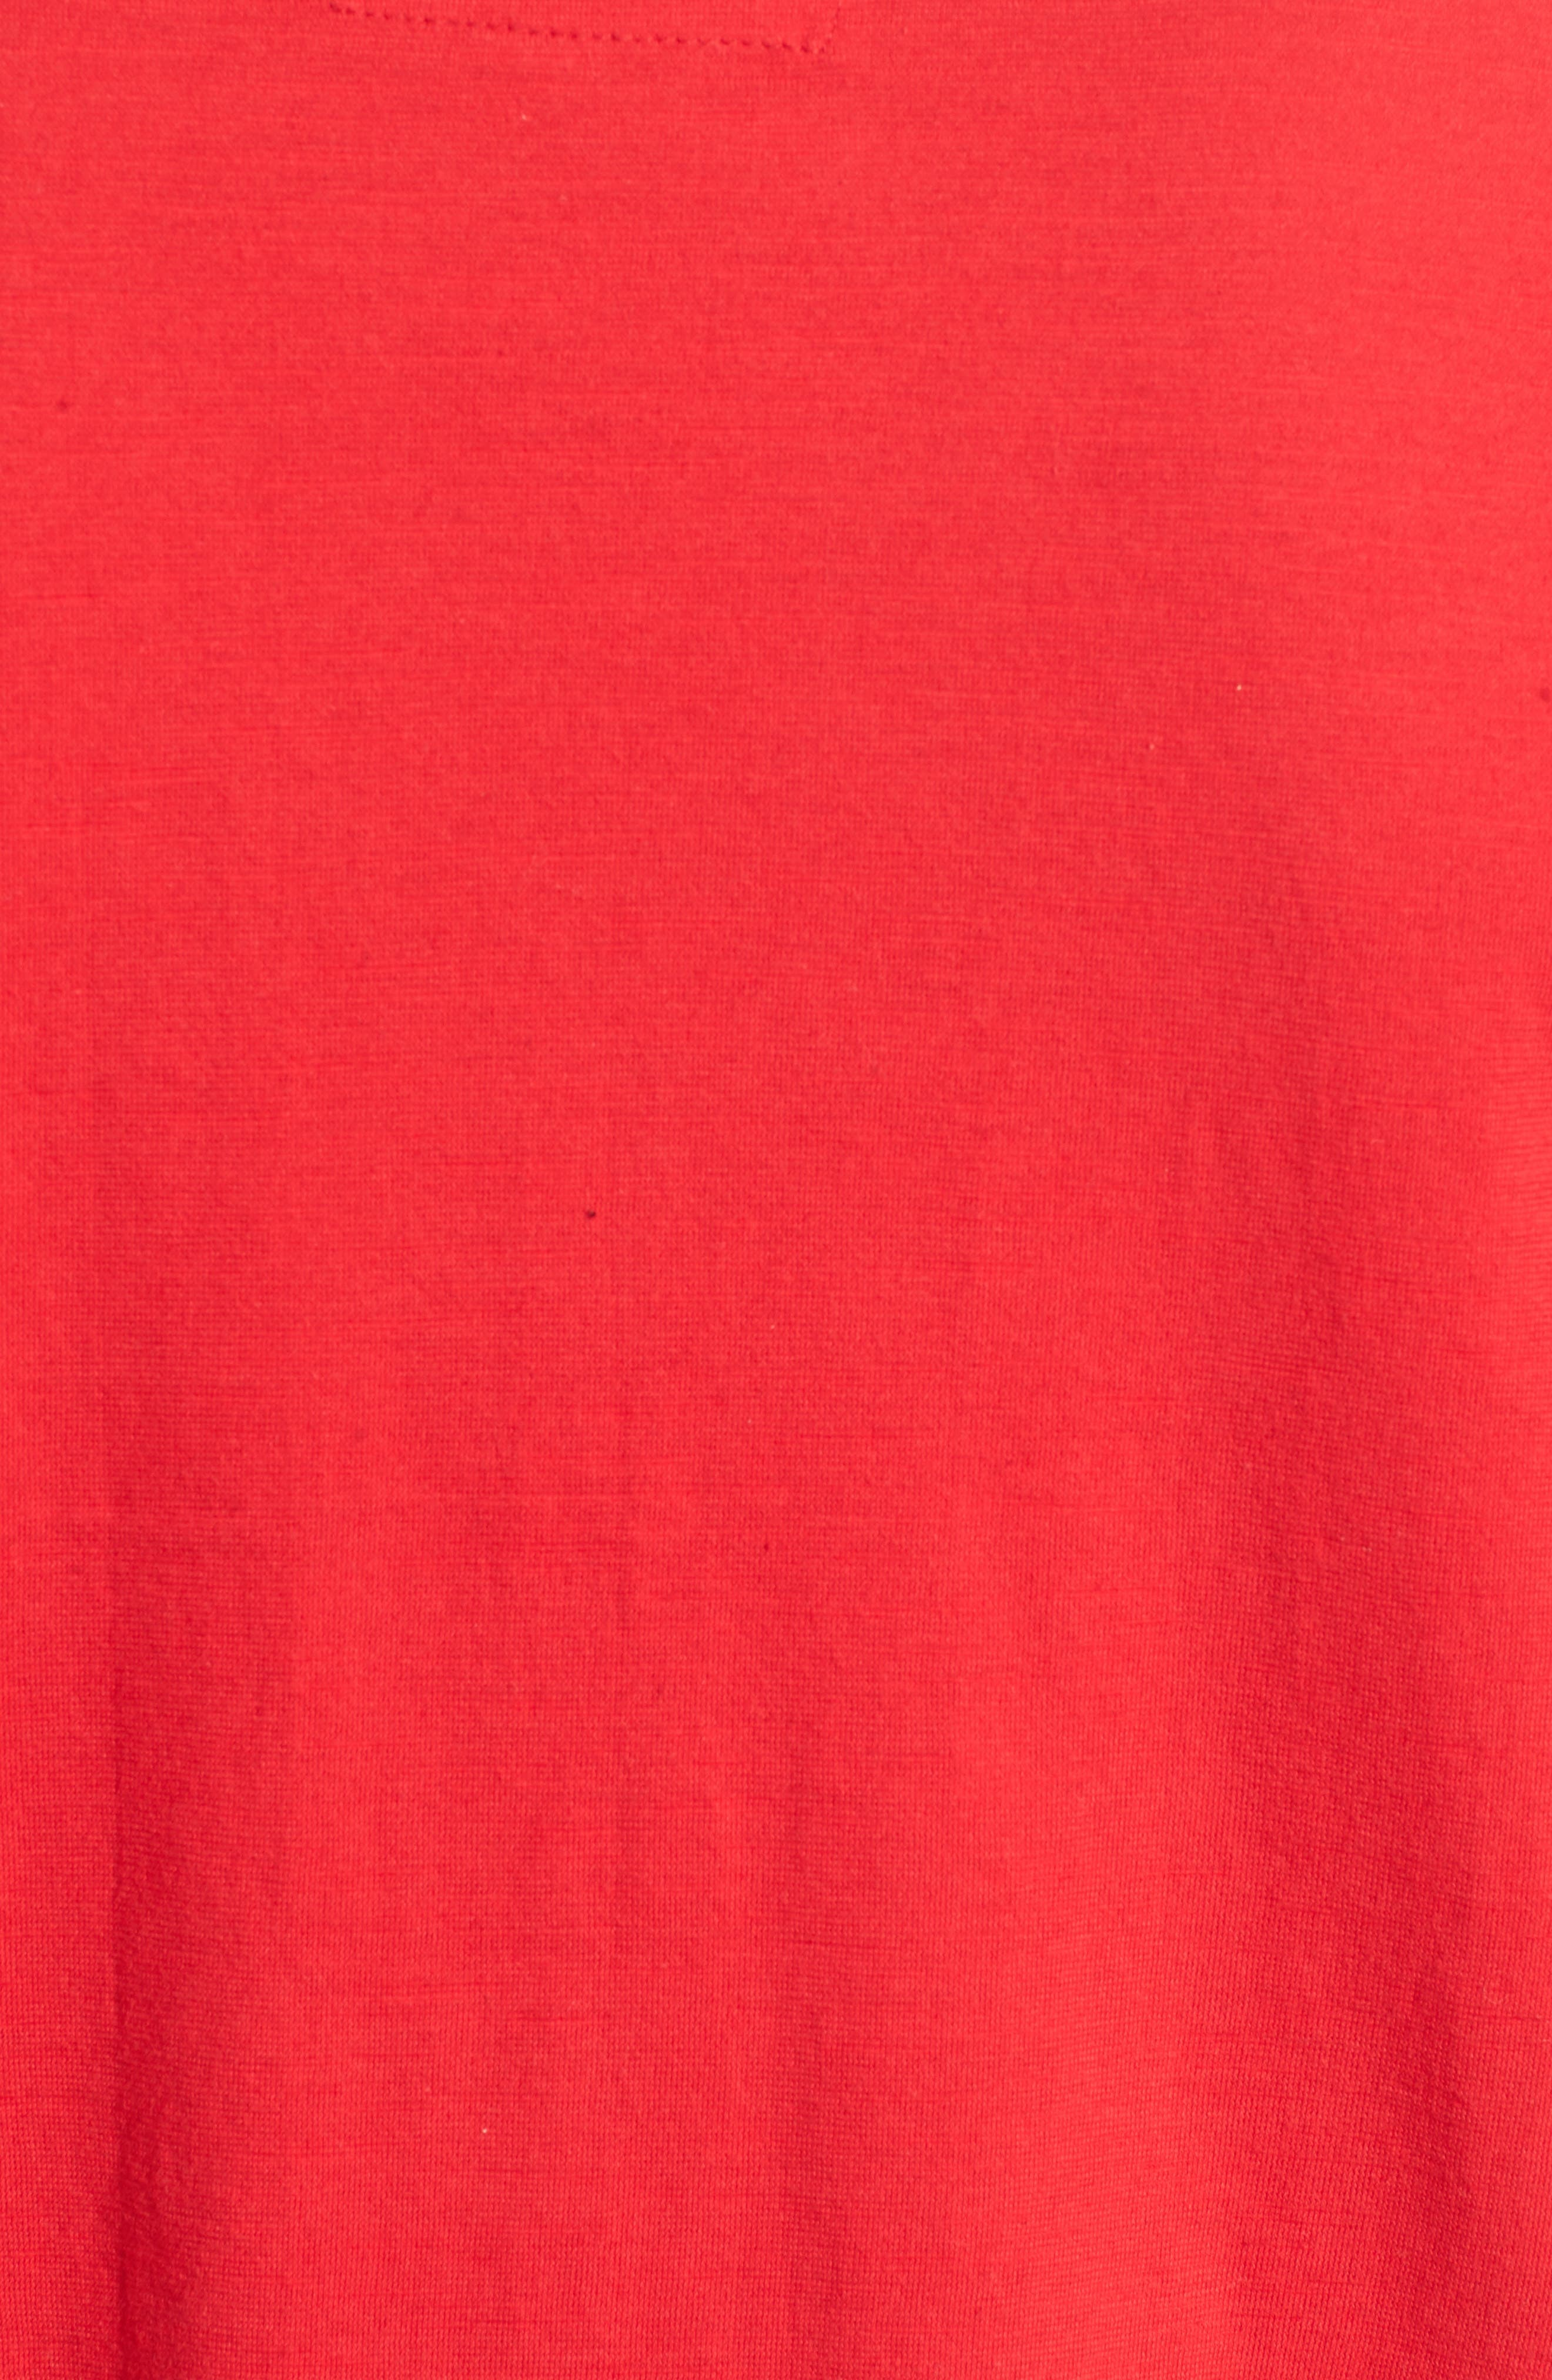 'Cincinnati Reds - Twofold' Crewneck T-Shirt,                             Alternate thumbnail 2, color,                             600